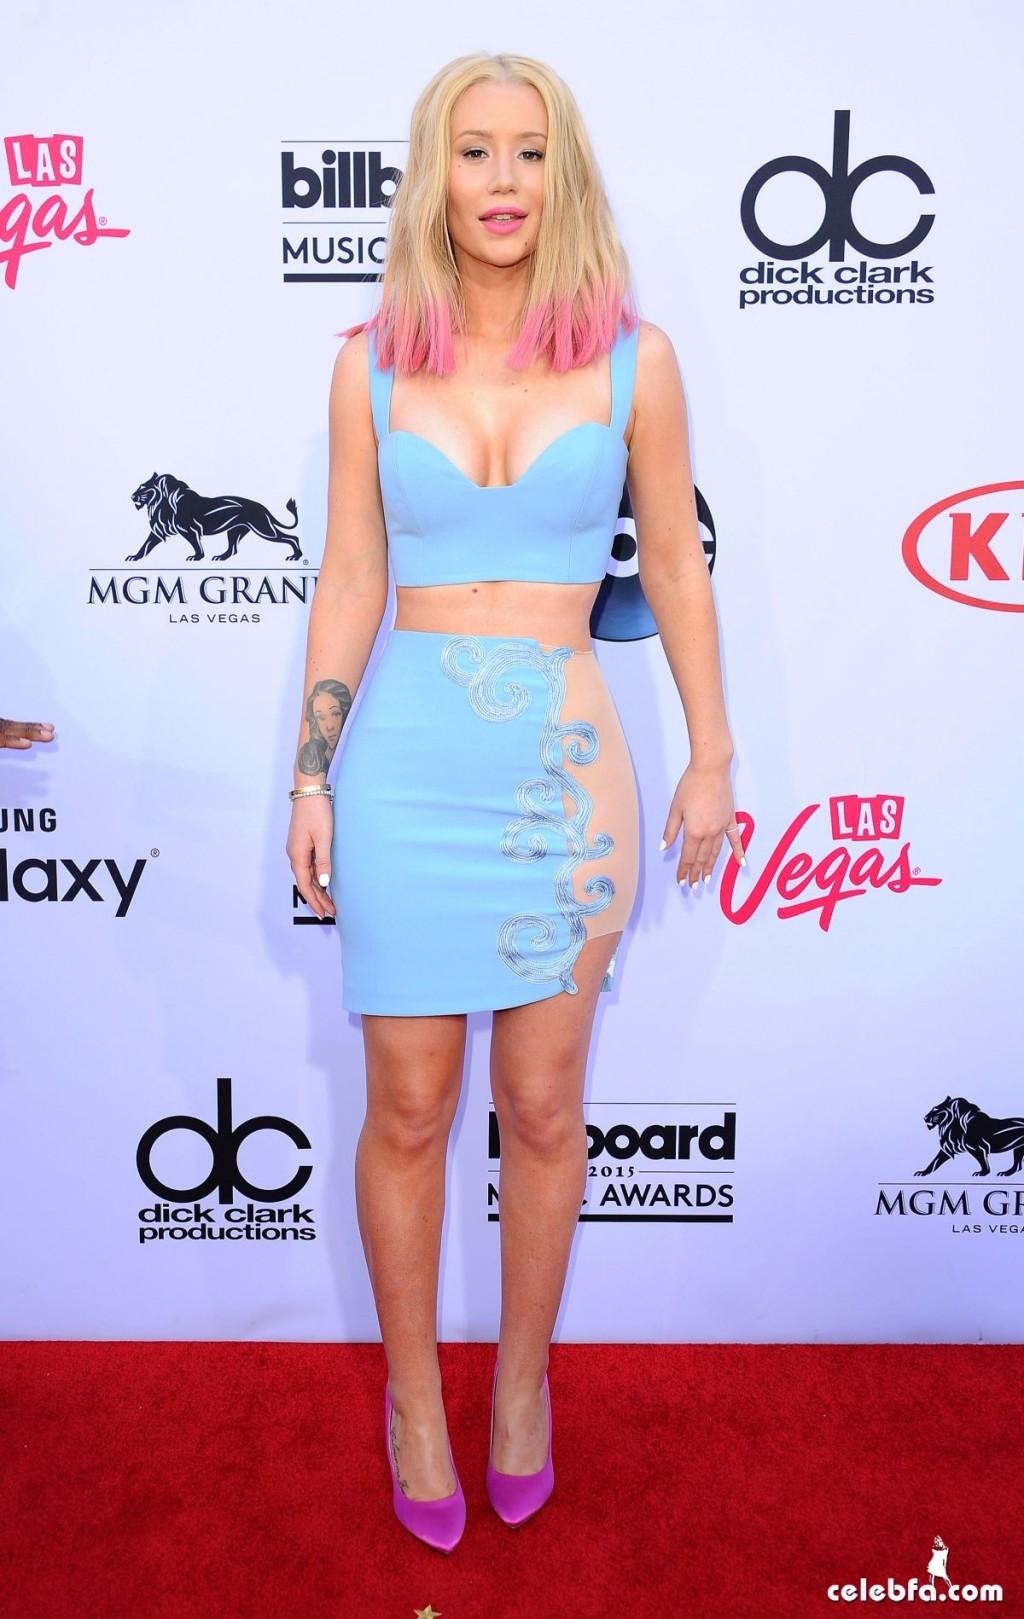 IGGY AZALEA at 2015 Billboard Music Awards (3)